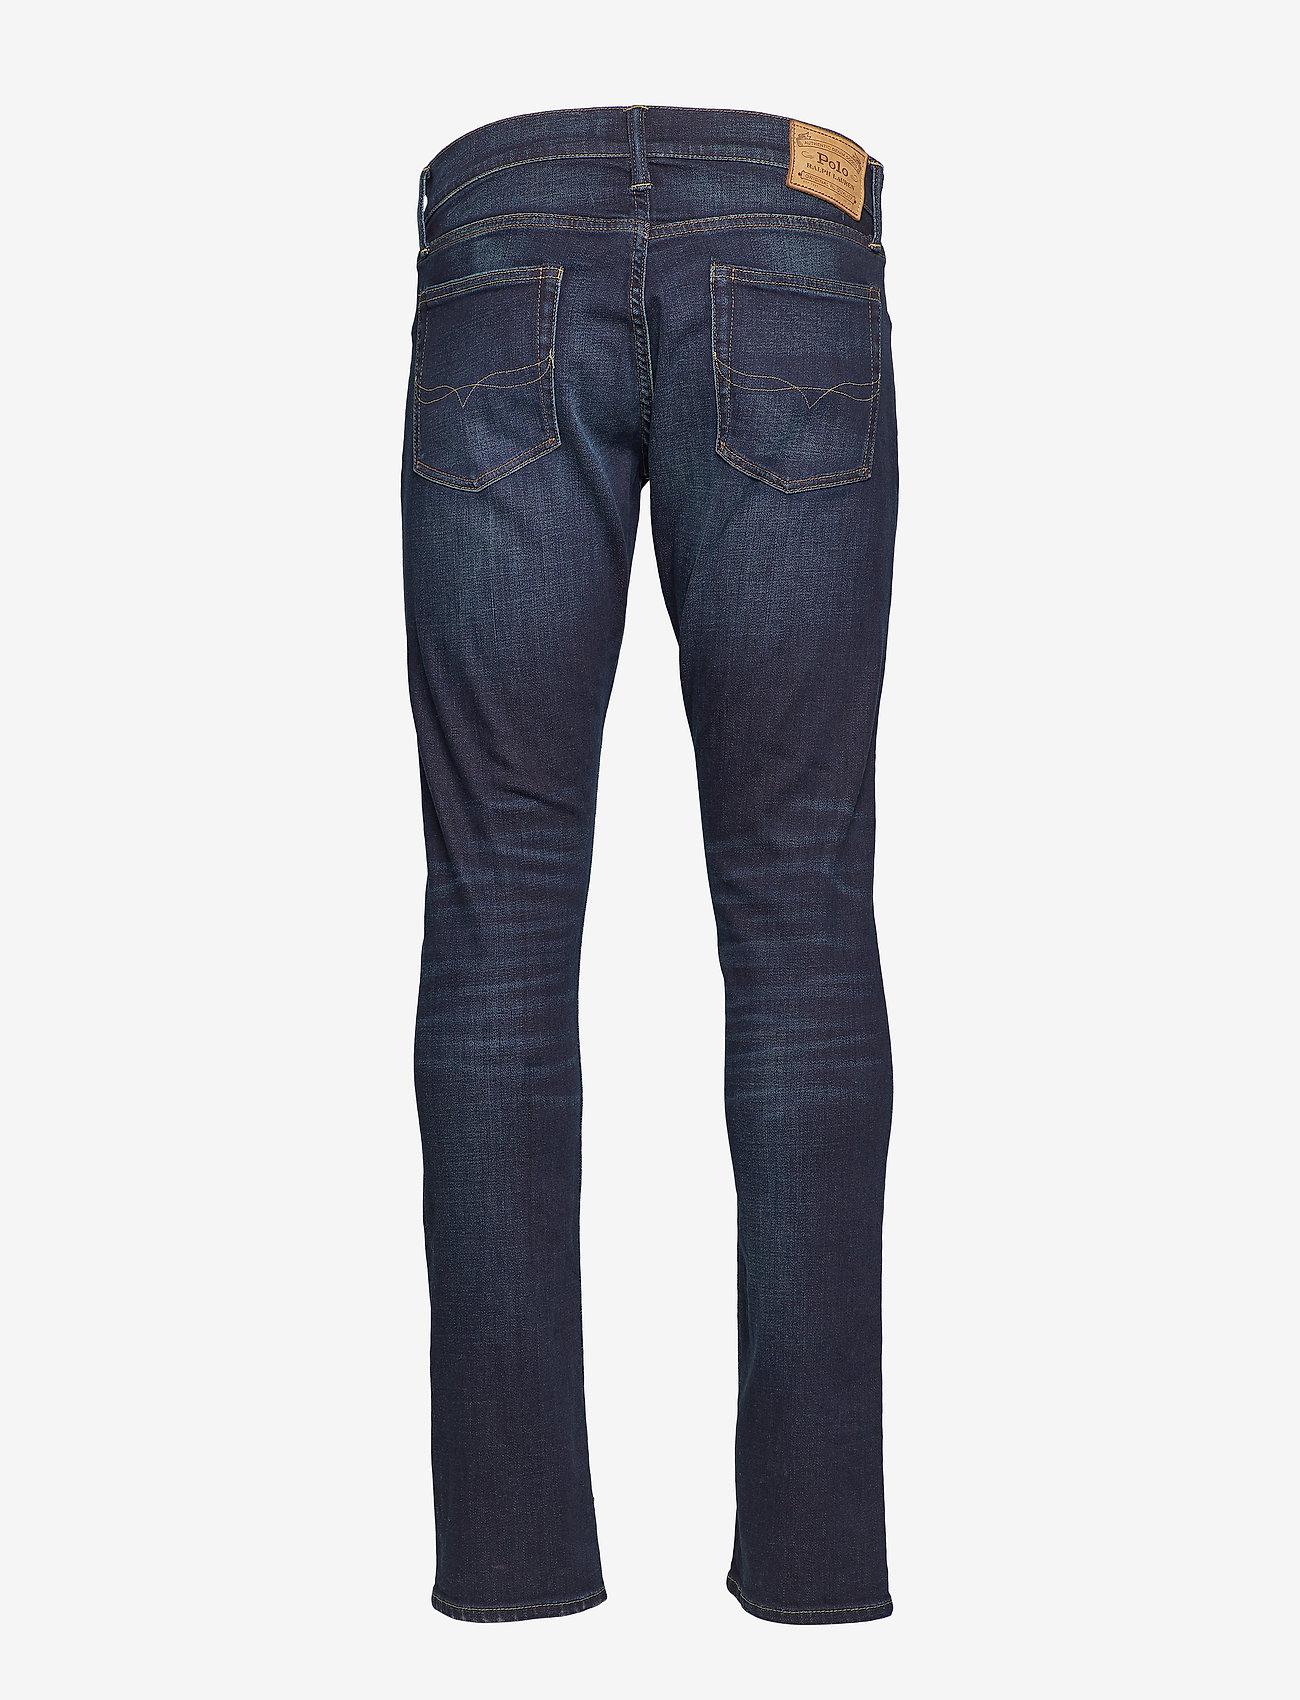 Sullivan Slim Stretch Jean (Murphy Stretch) - Polo Ralph Lauren DXRTjA